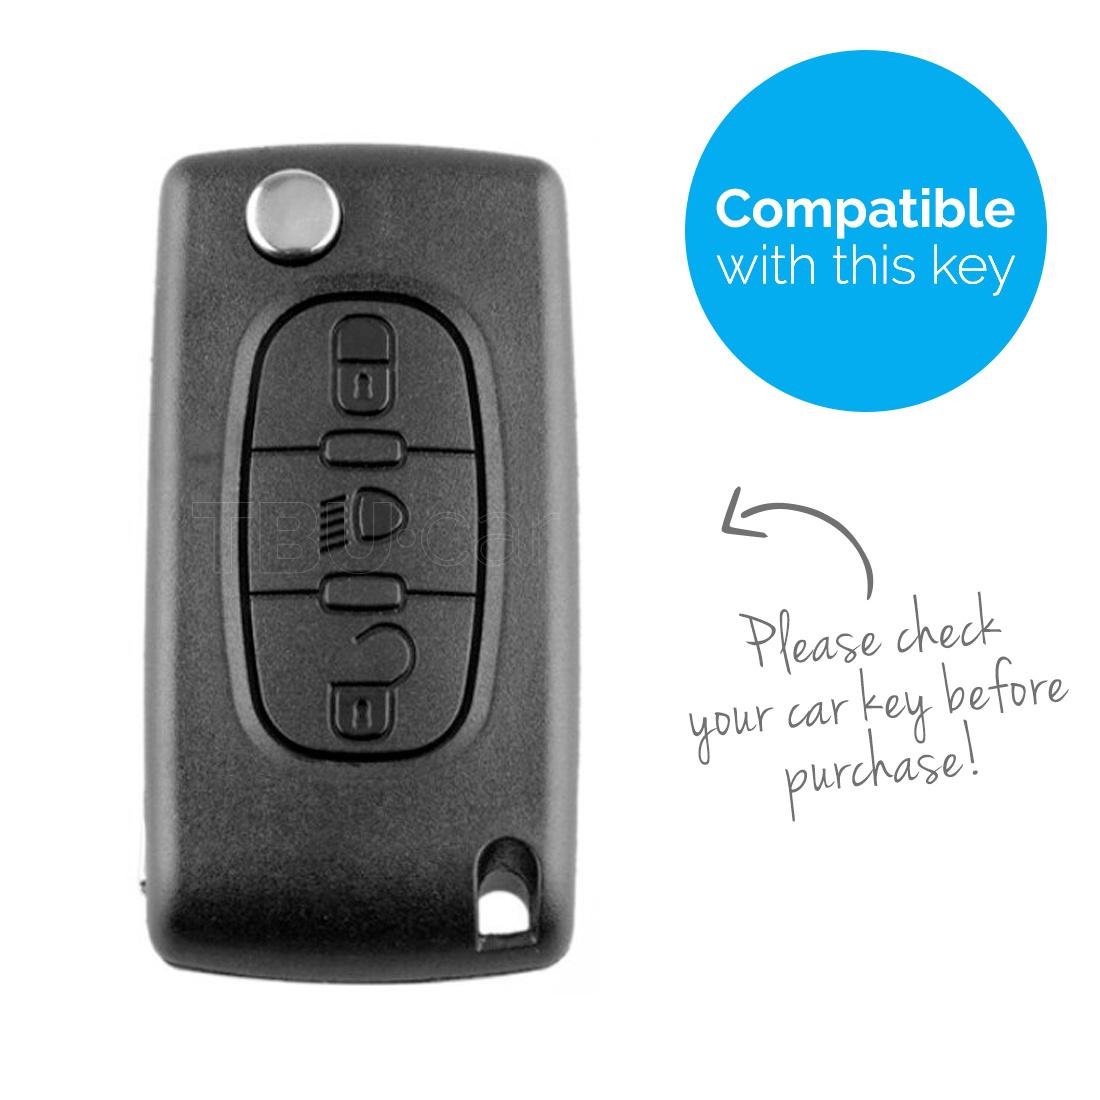 TBU car Autoschlüssel Hülle für Peugeot 3 Tasten (Licht Taste) - Schutzhülle aus Silikon - Auto Schlüsselhülle Cover in Lindgrün